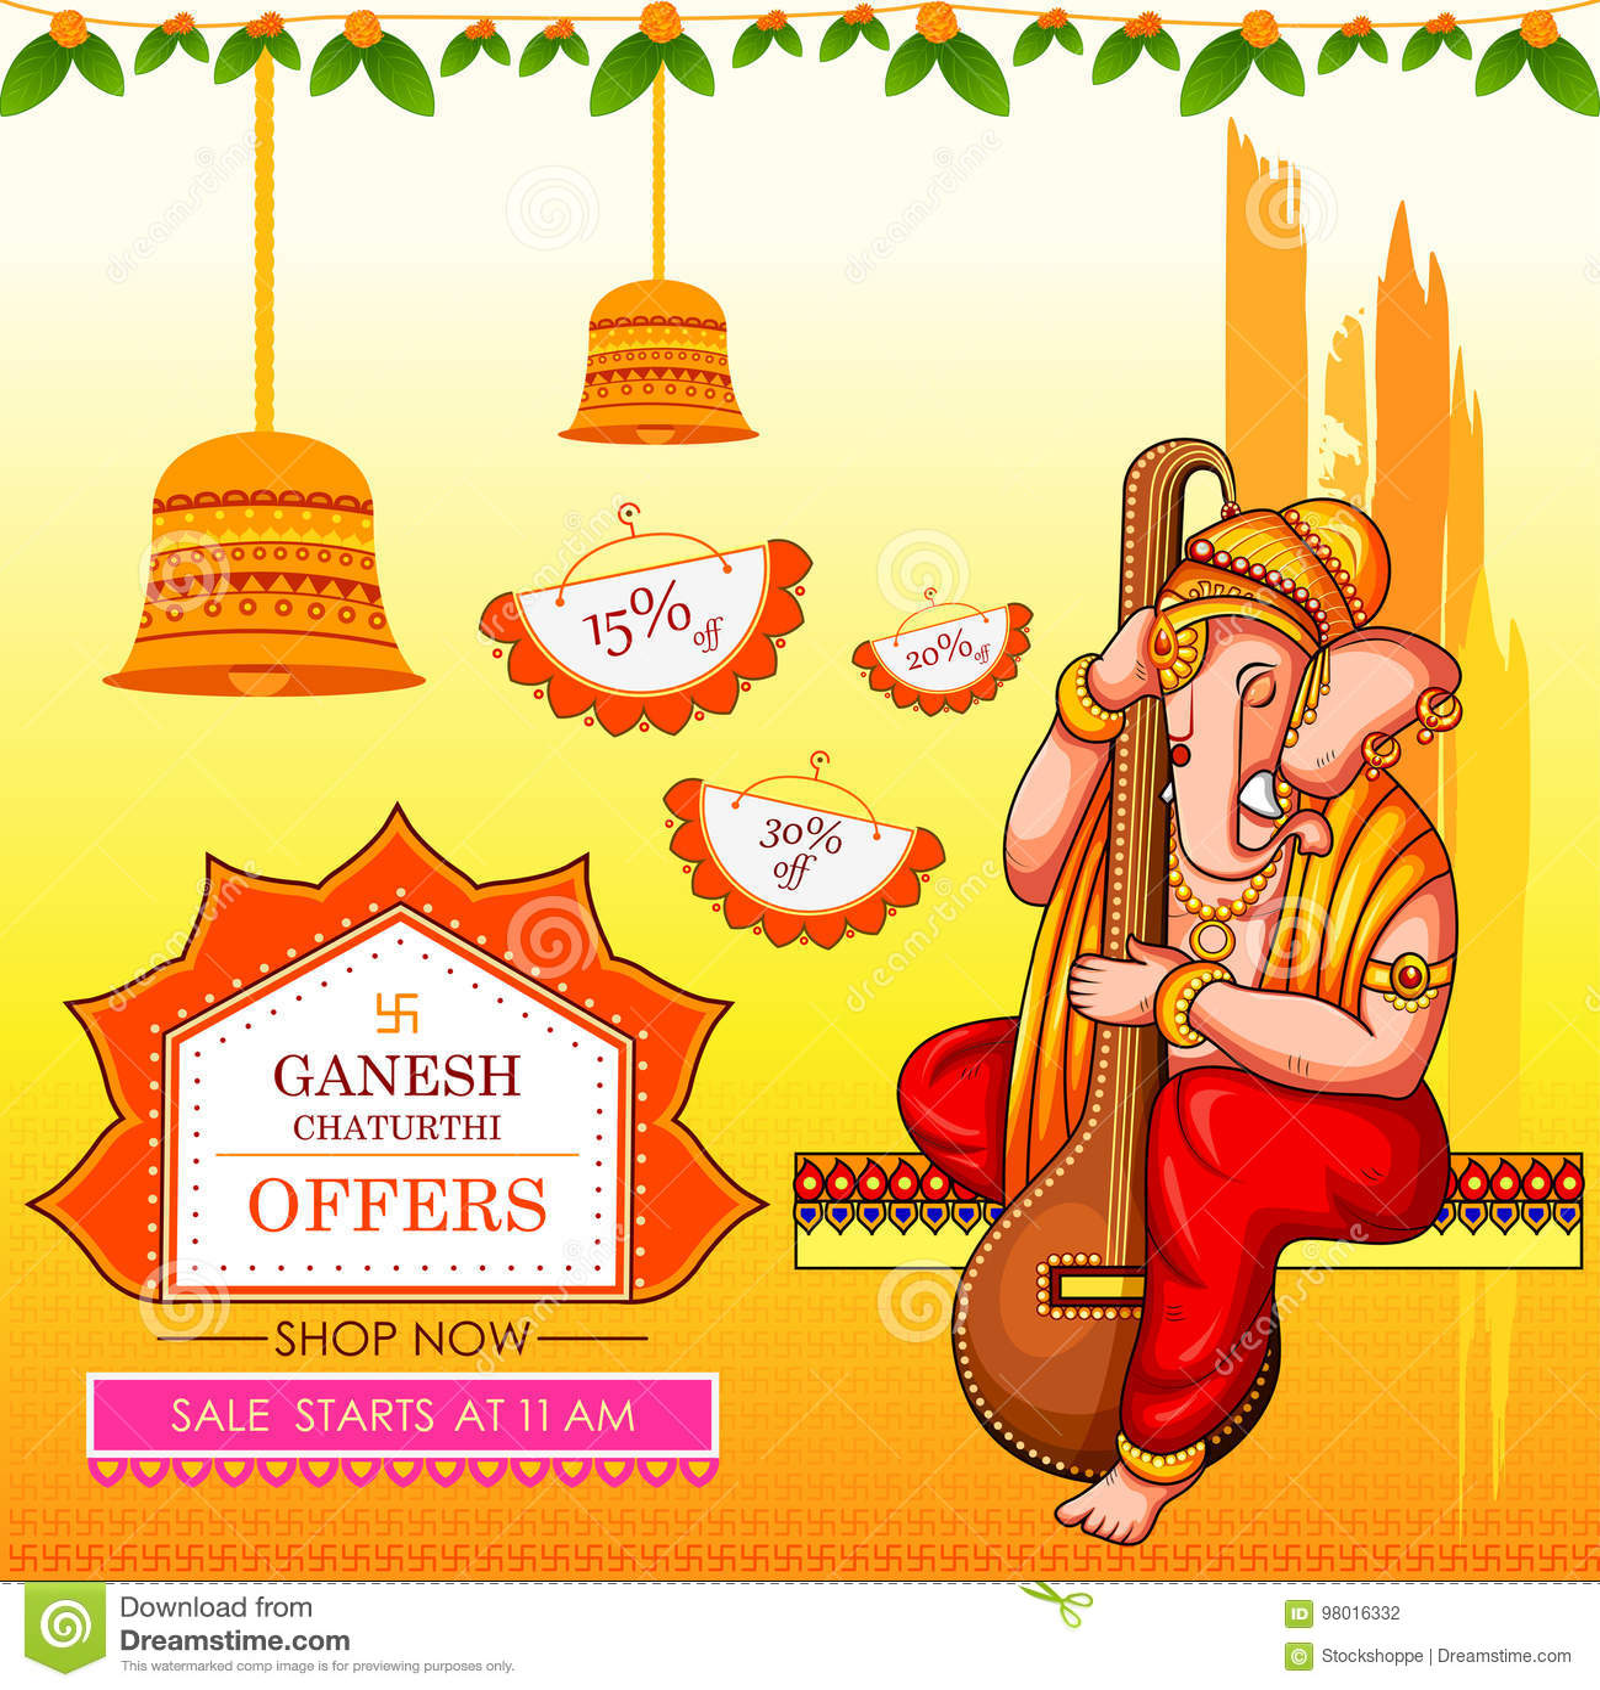 Lord Ganapati For Happy Ganesh Chaturthi Festival Shopping